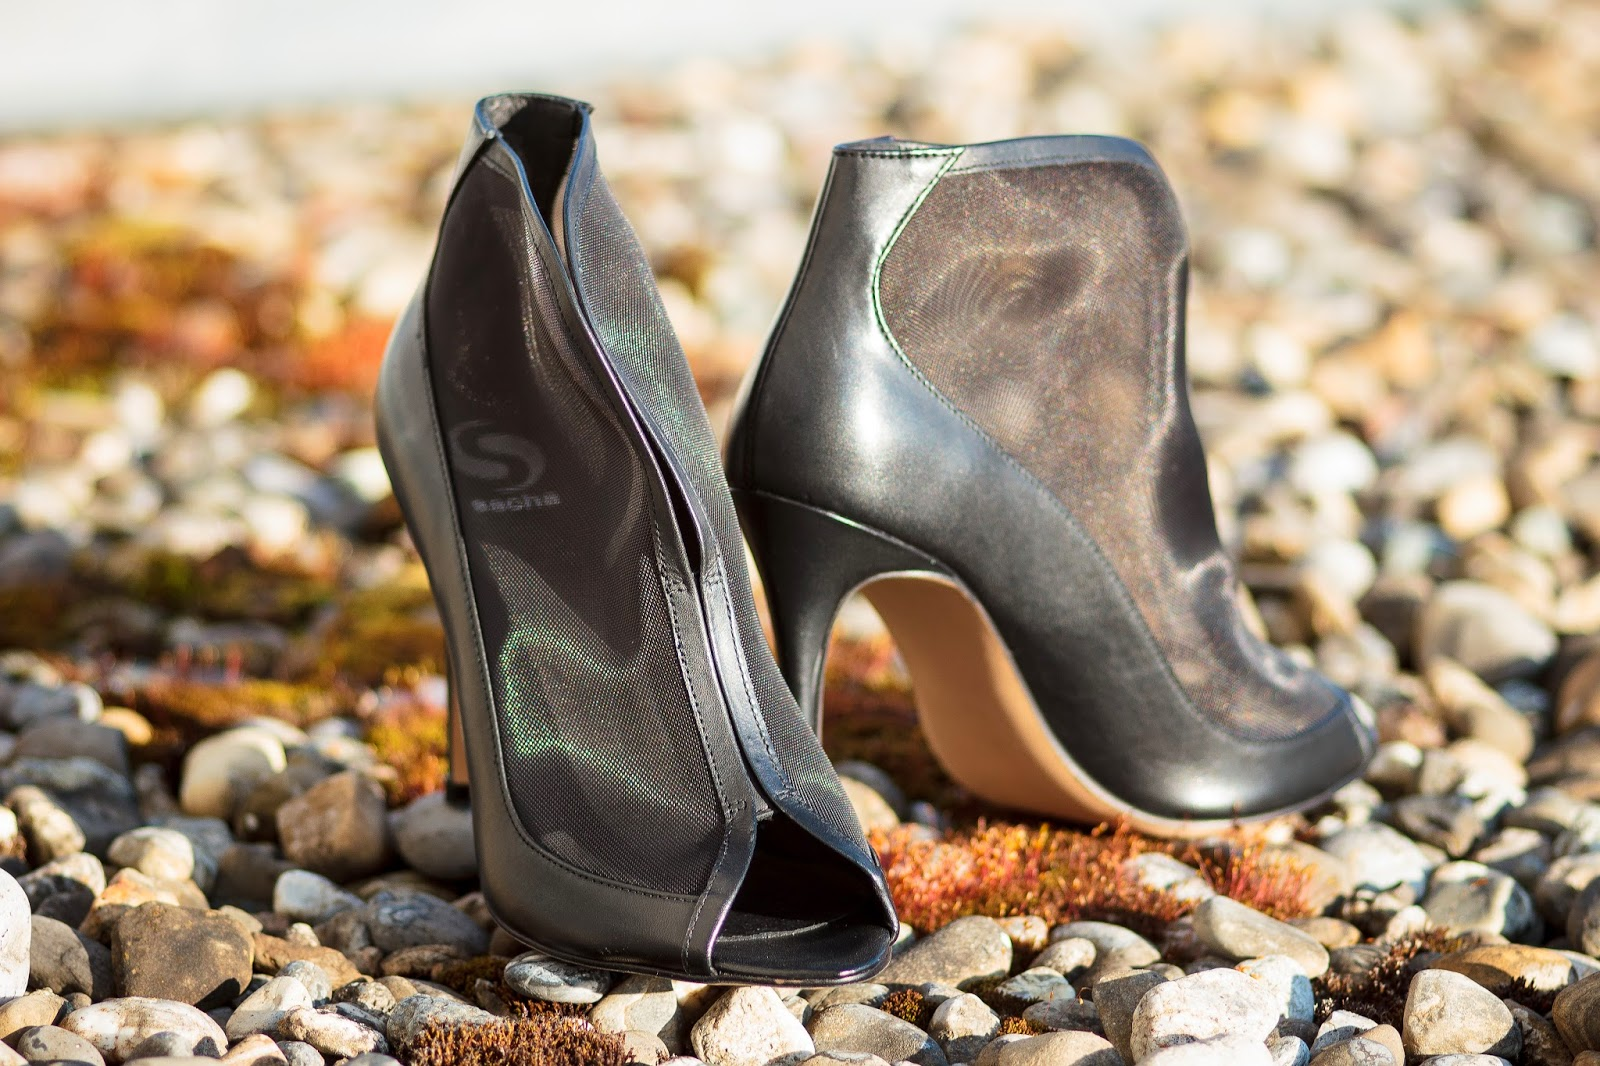 SHOES: MODE JUNKIE MESH BOOTS BY SACHA PRIZMAHFASHION